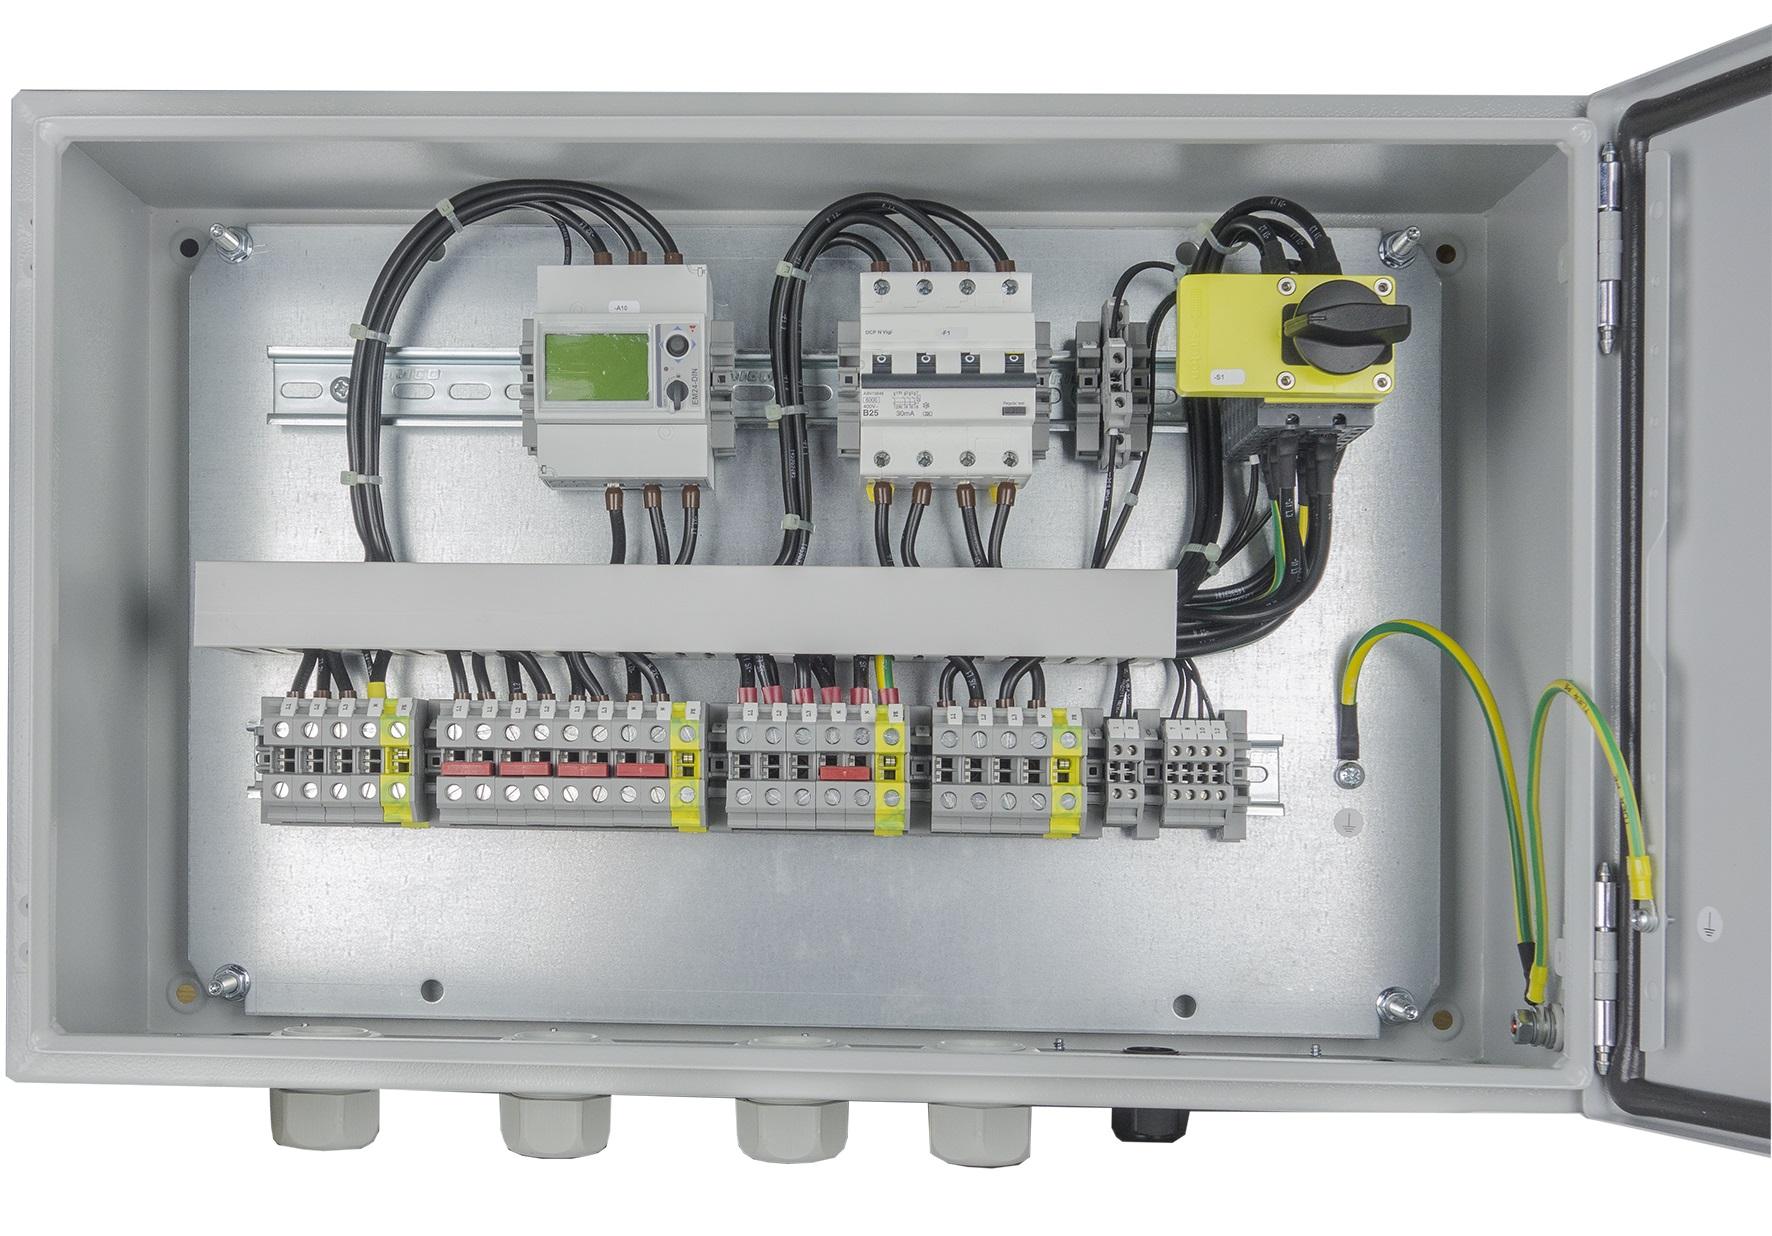 1 Stk Notstrom Box GMB 24 PVES0006--